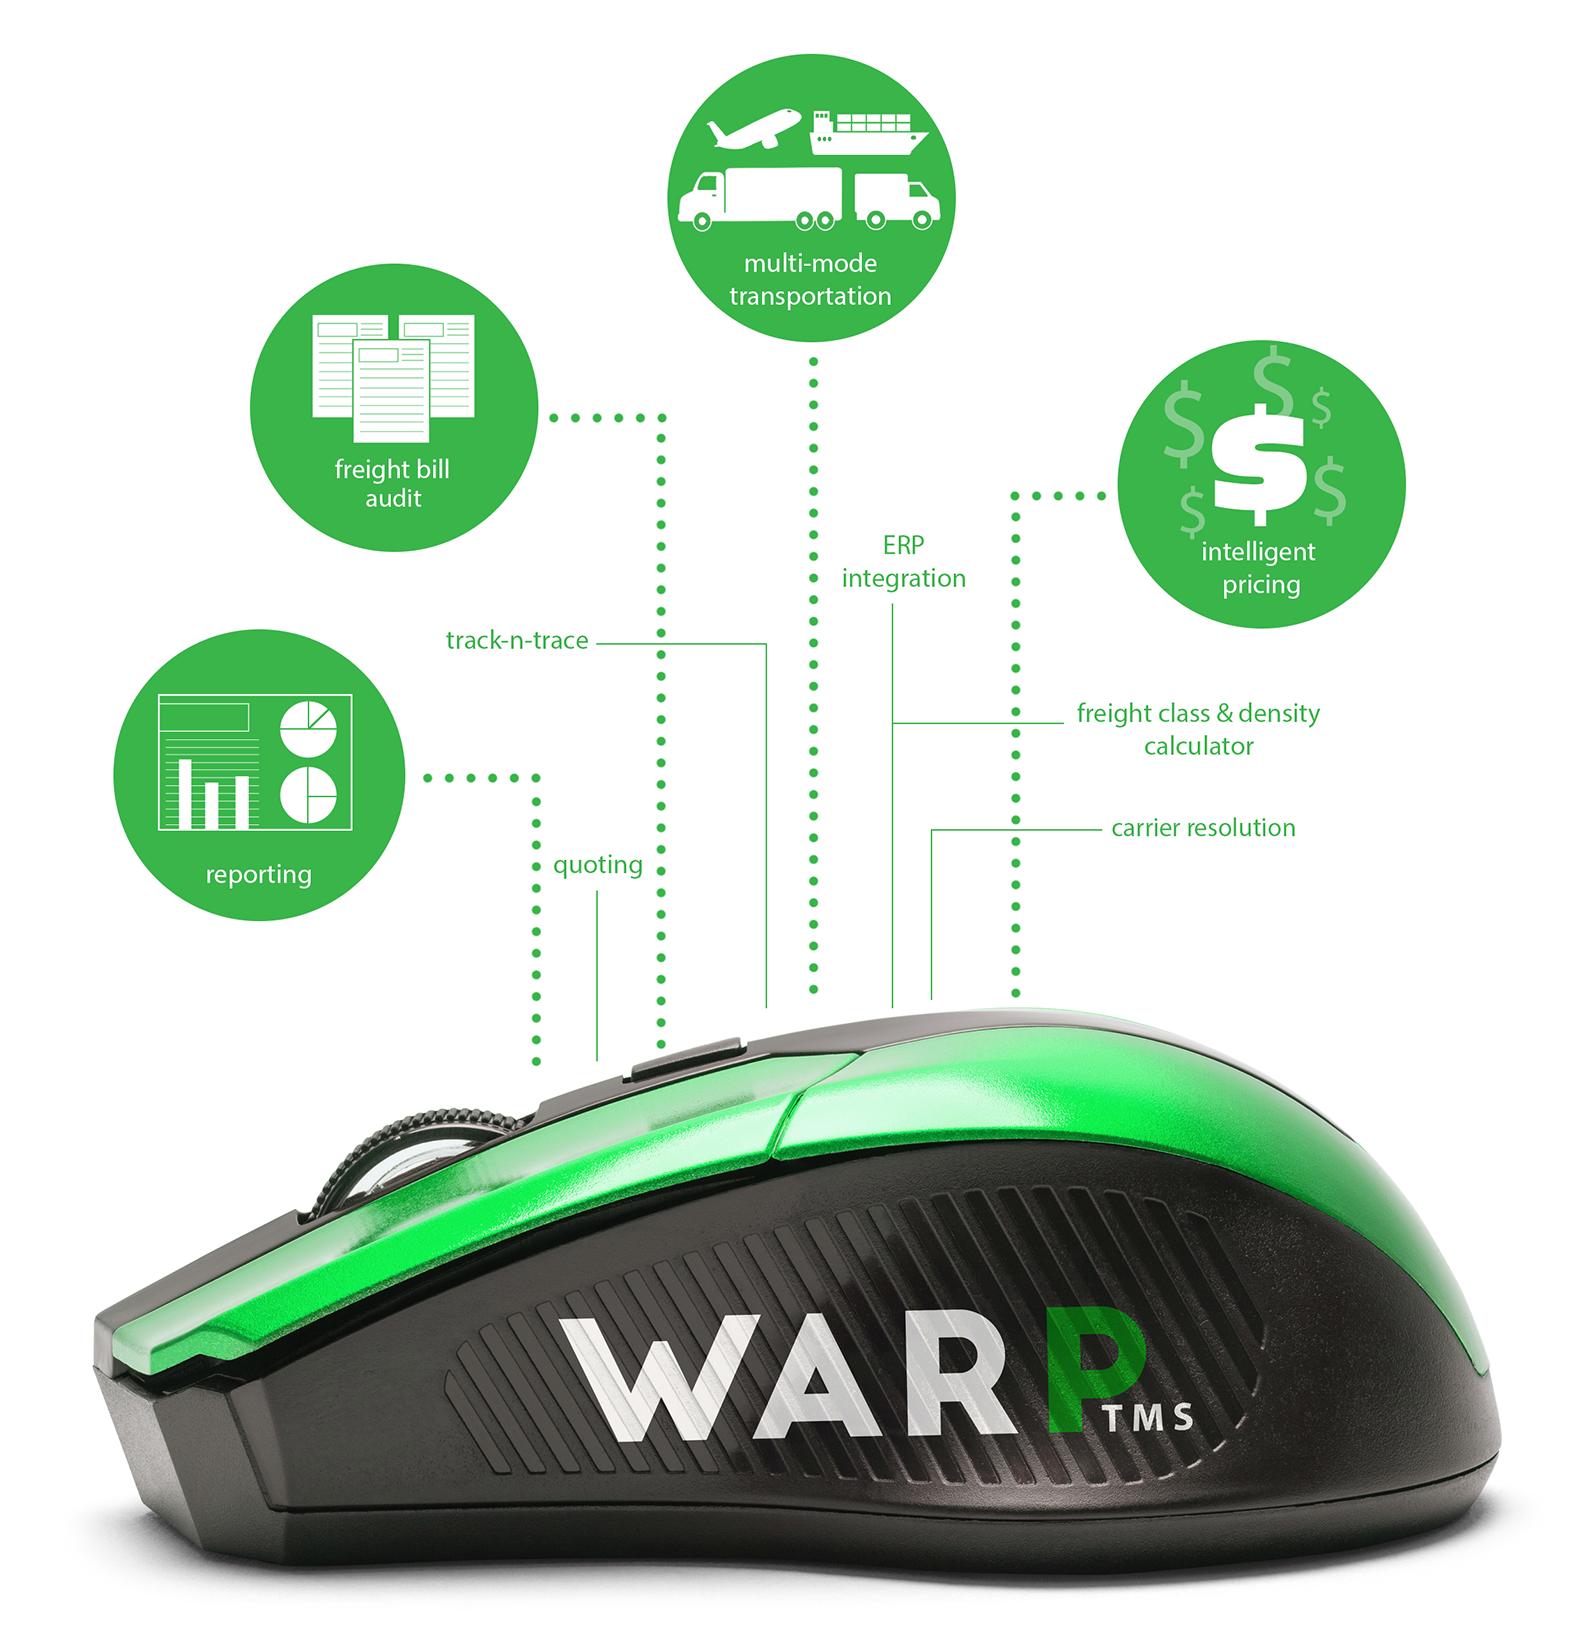 Warp TMS home screen image